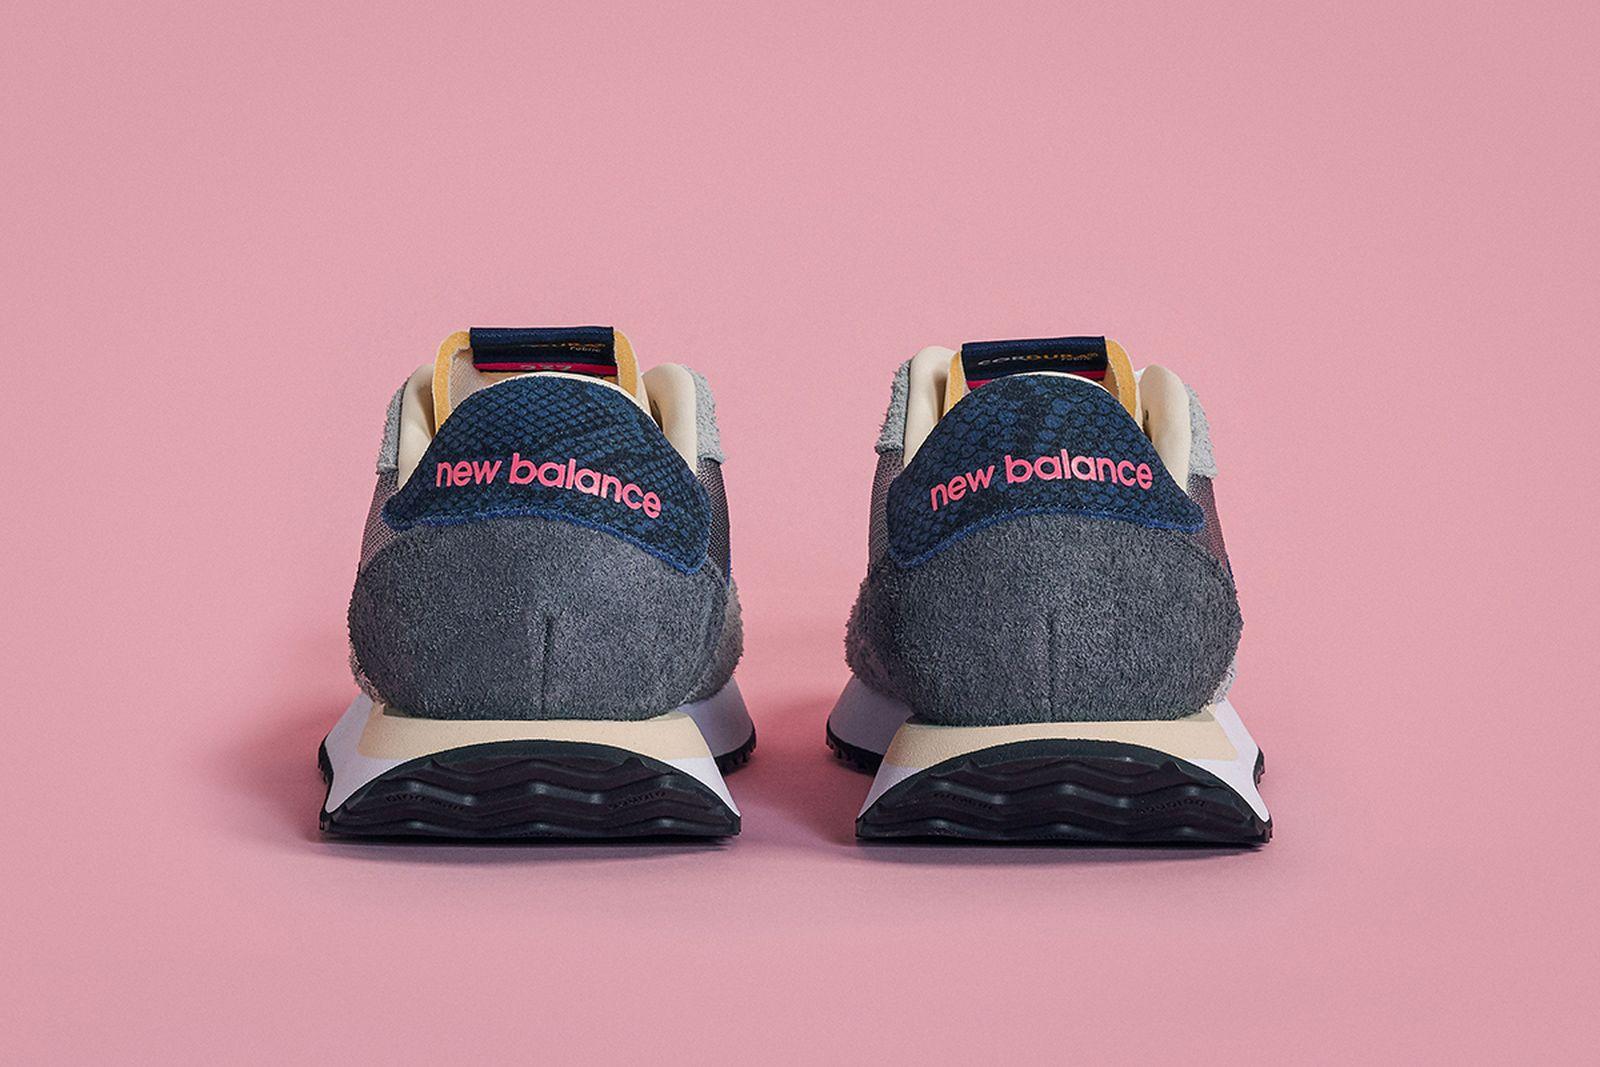 sneakersnstuff-new-balance-237-release-date-price-11